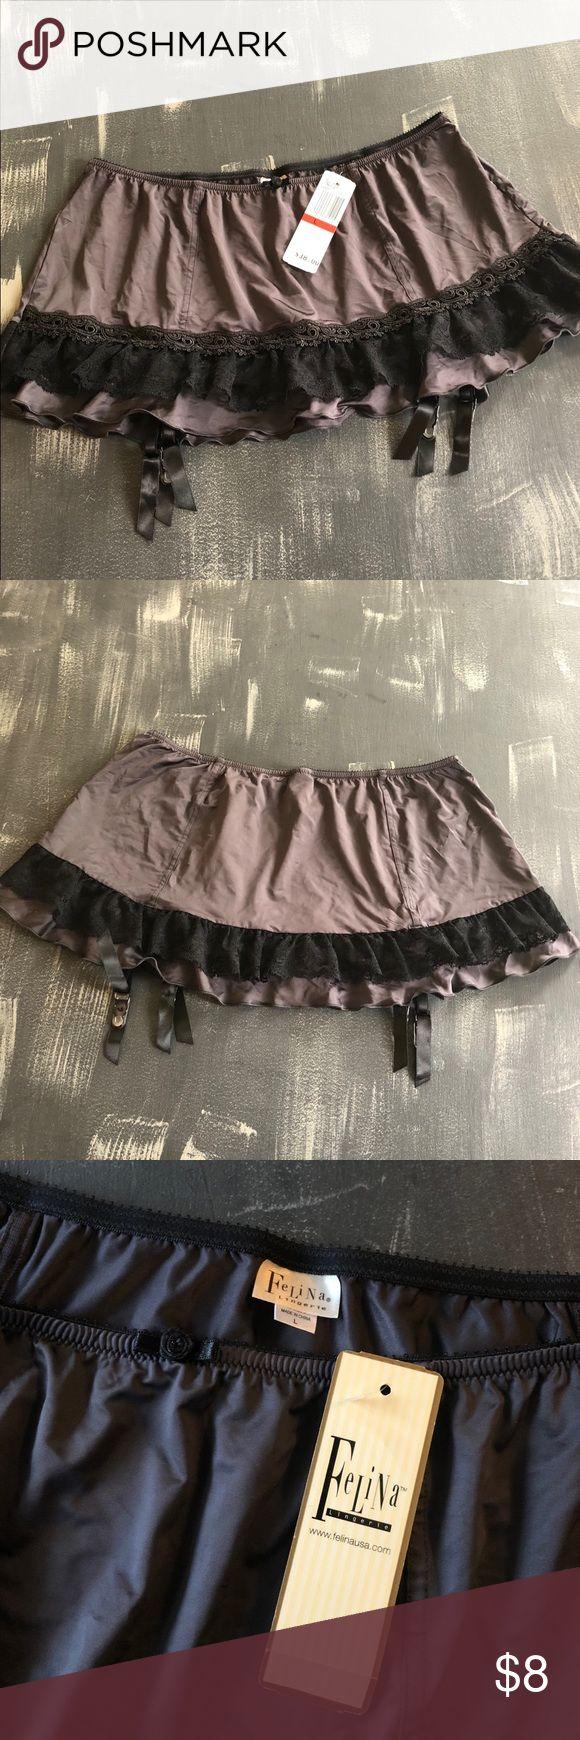 Felina Lingerie Size L. Brand new with tags Felina Intimates & Sleepwear